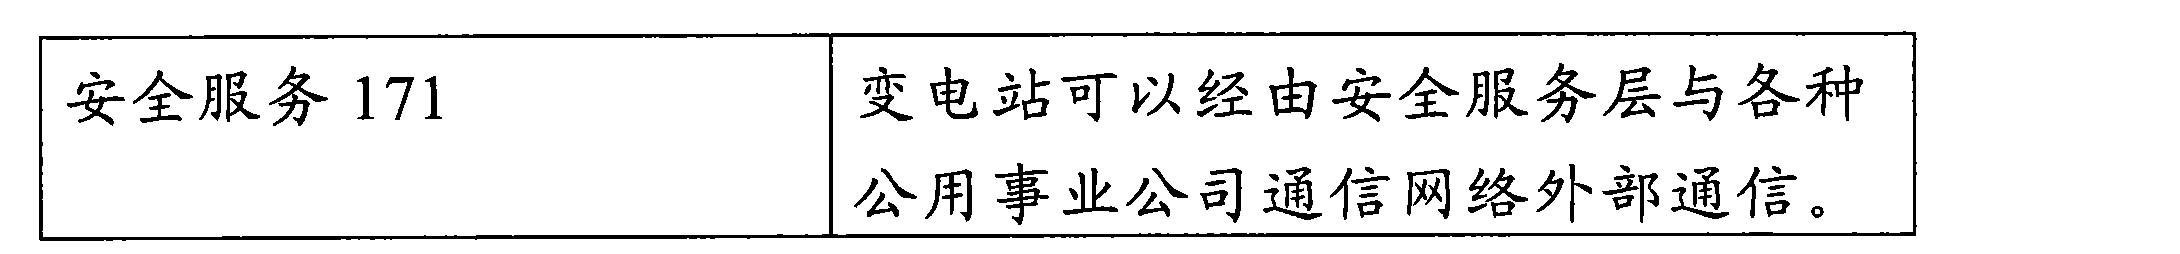 Figure CN102812334AD00211